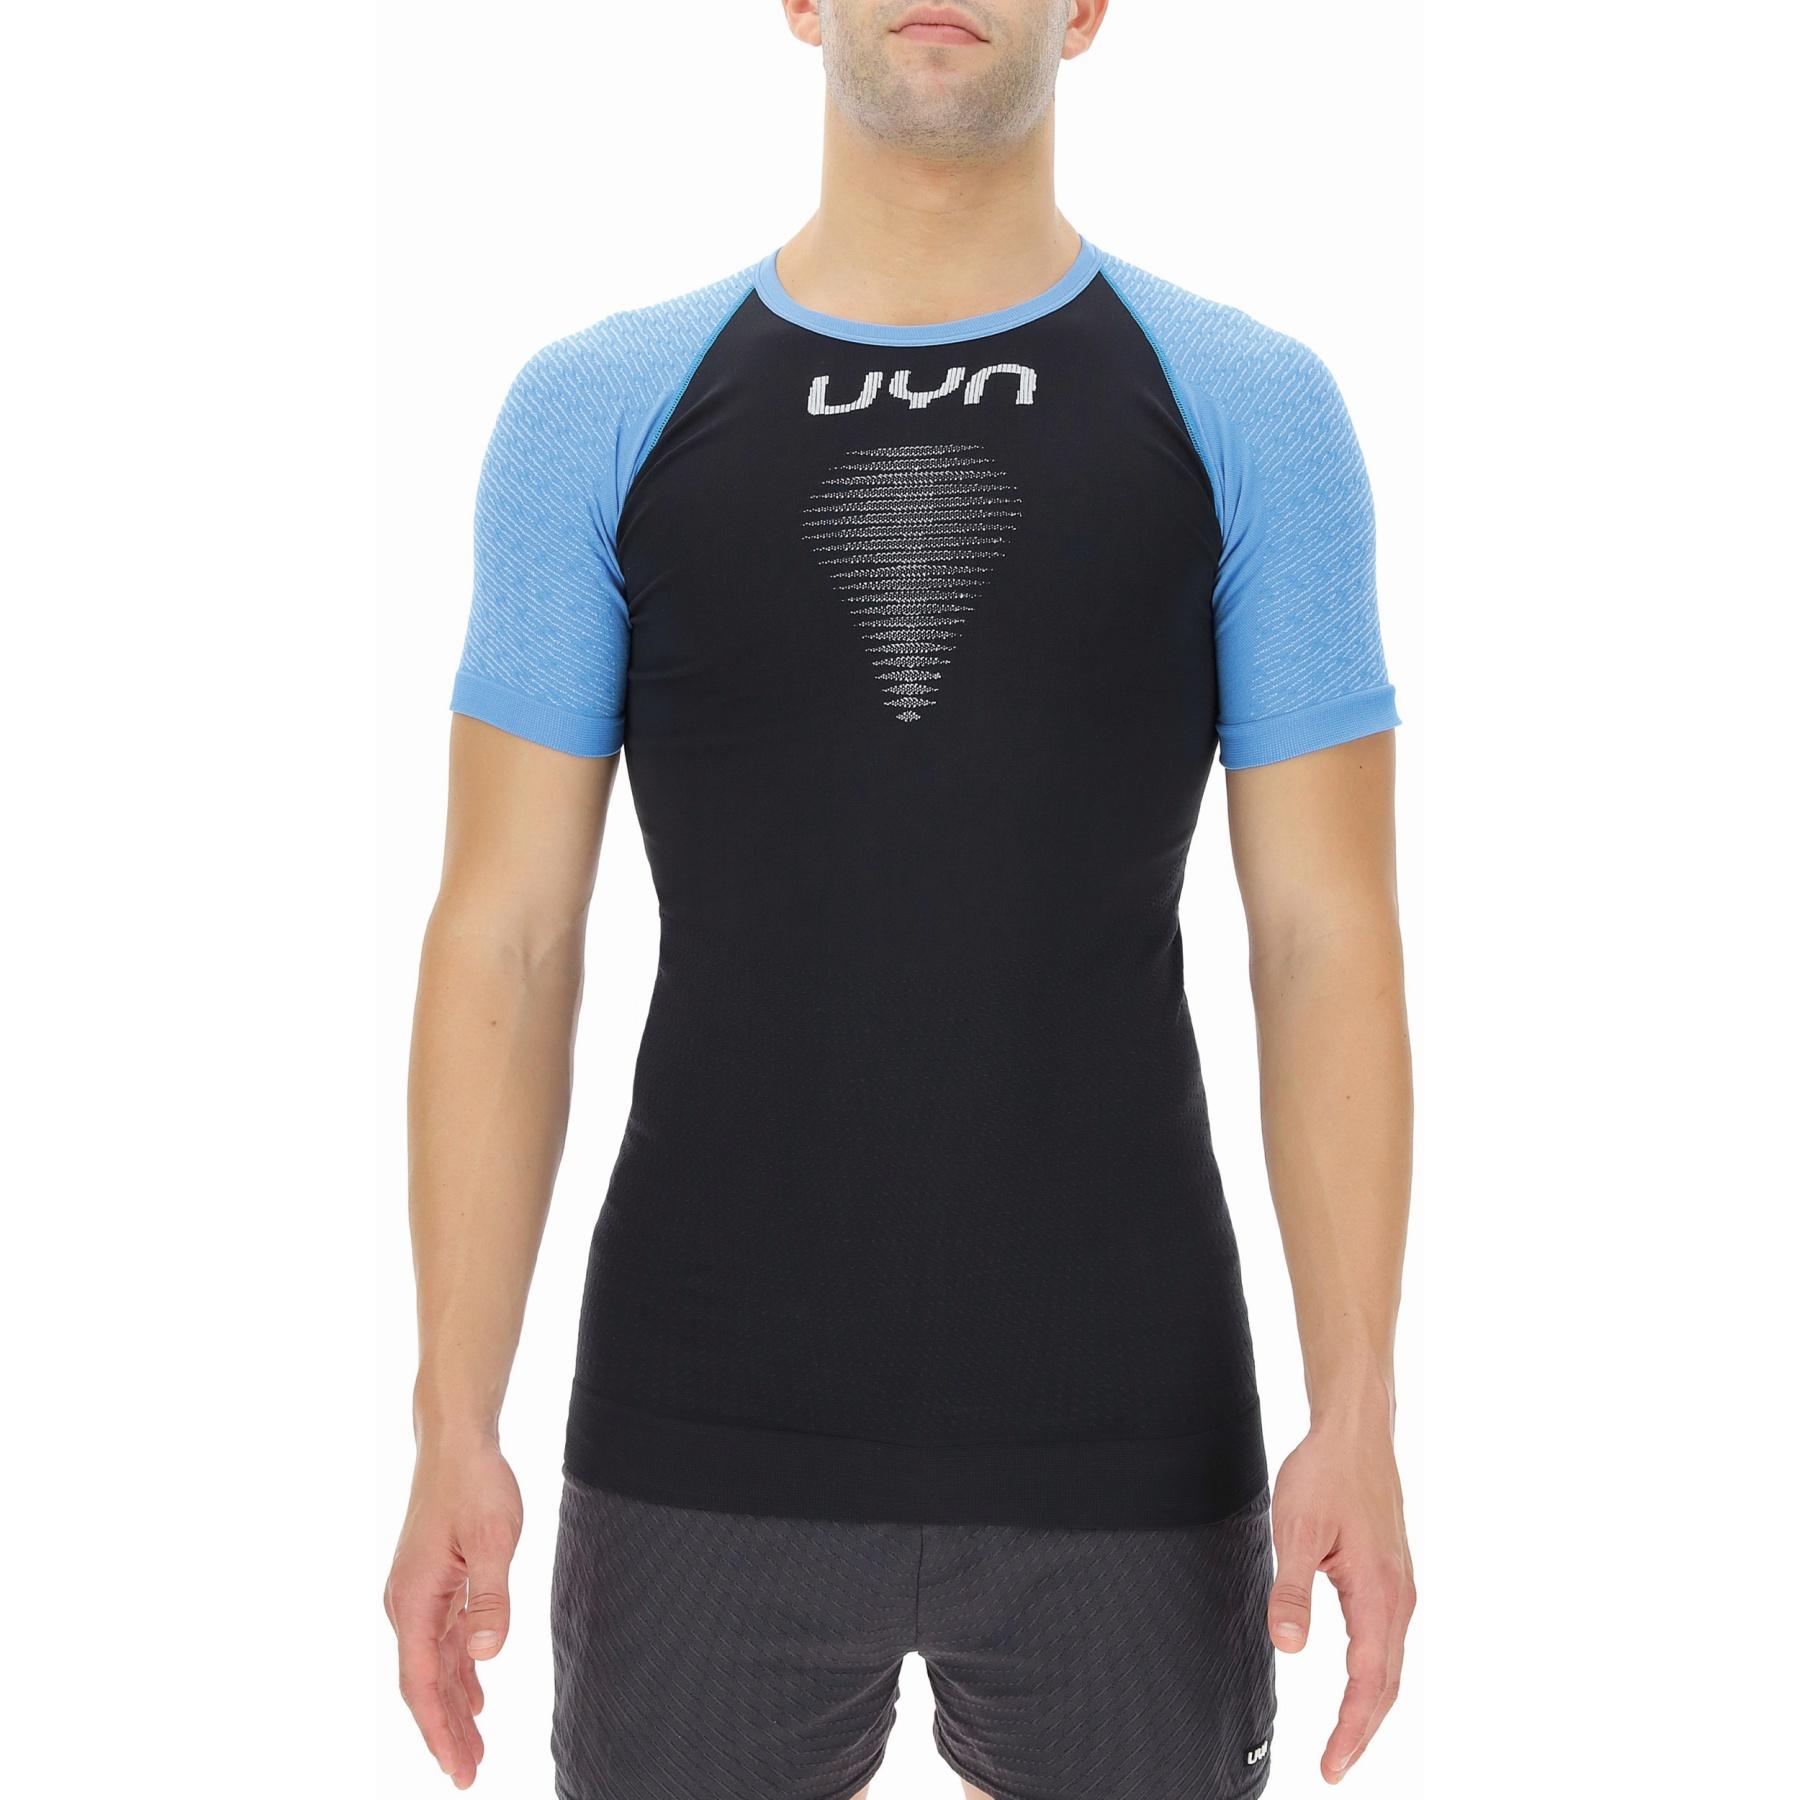 UYN Marathon Running Herren Kurzärmliges Shirt - Blackboard/Swedish Blue/White